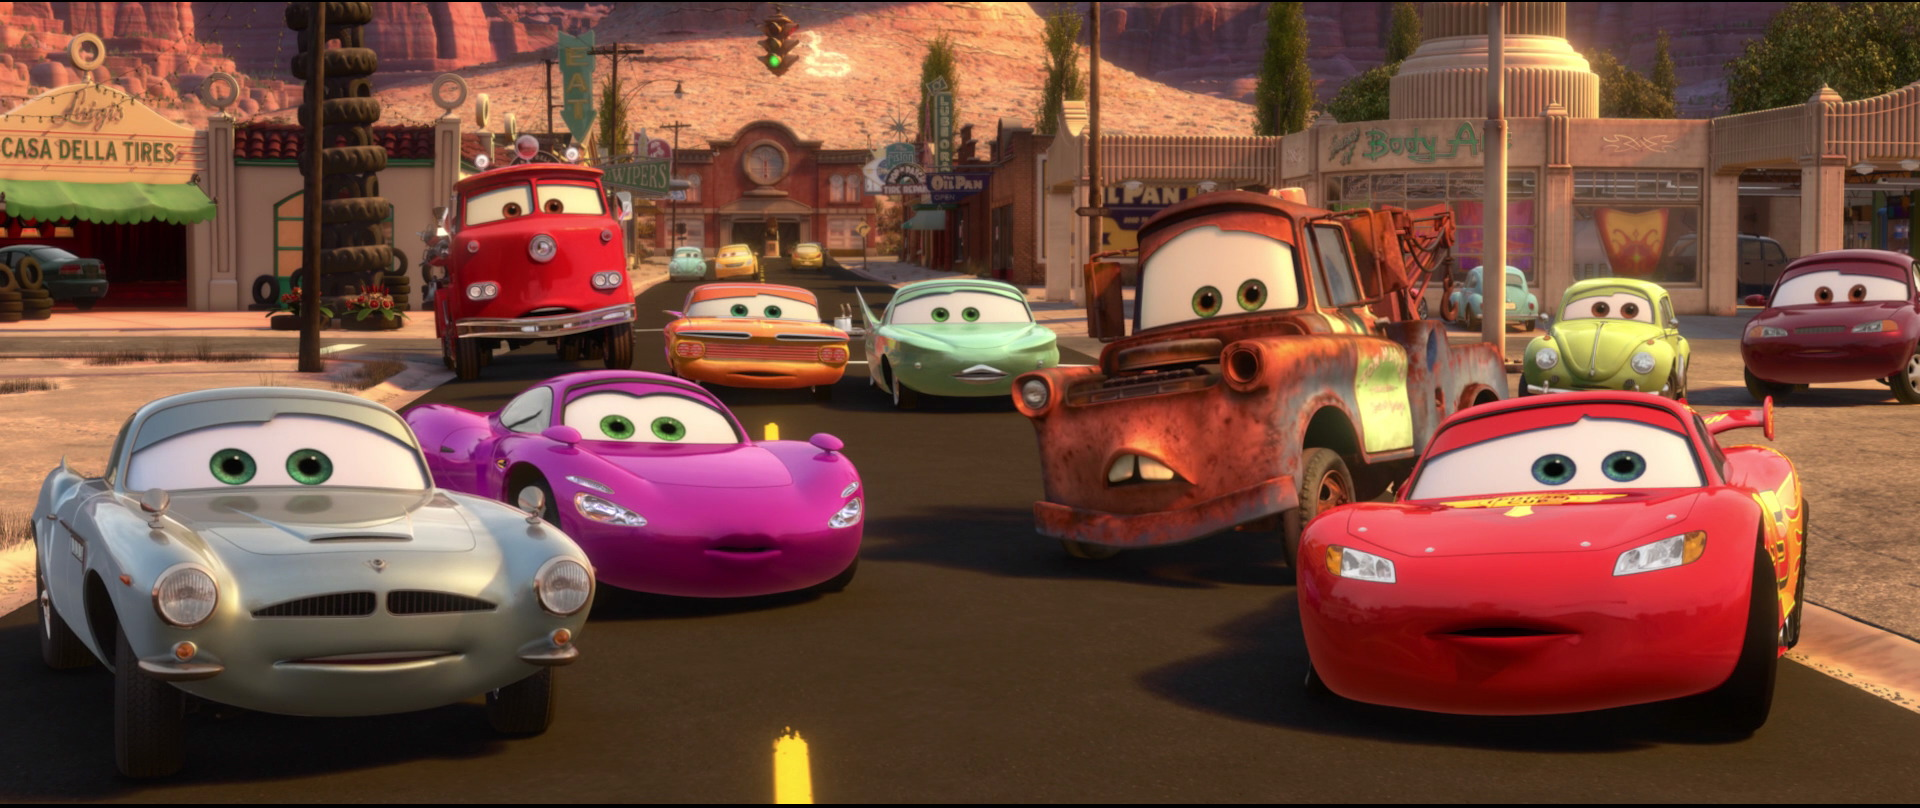 Image Cars2 Disneyscreencaps Com 11222 Jpg Heroes Wiki